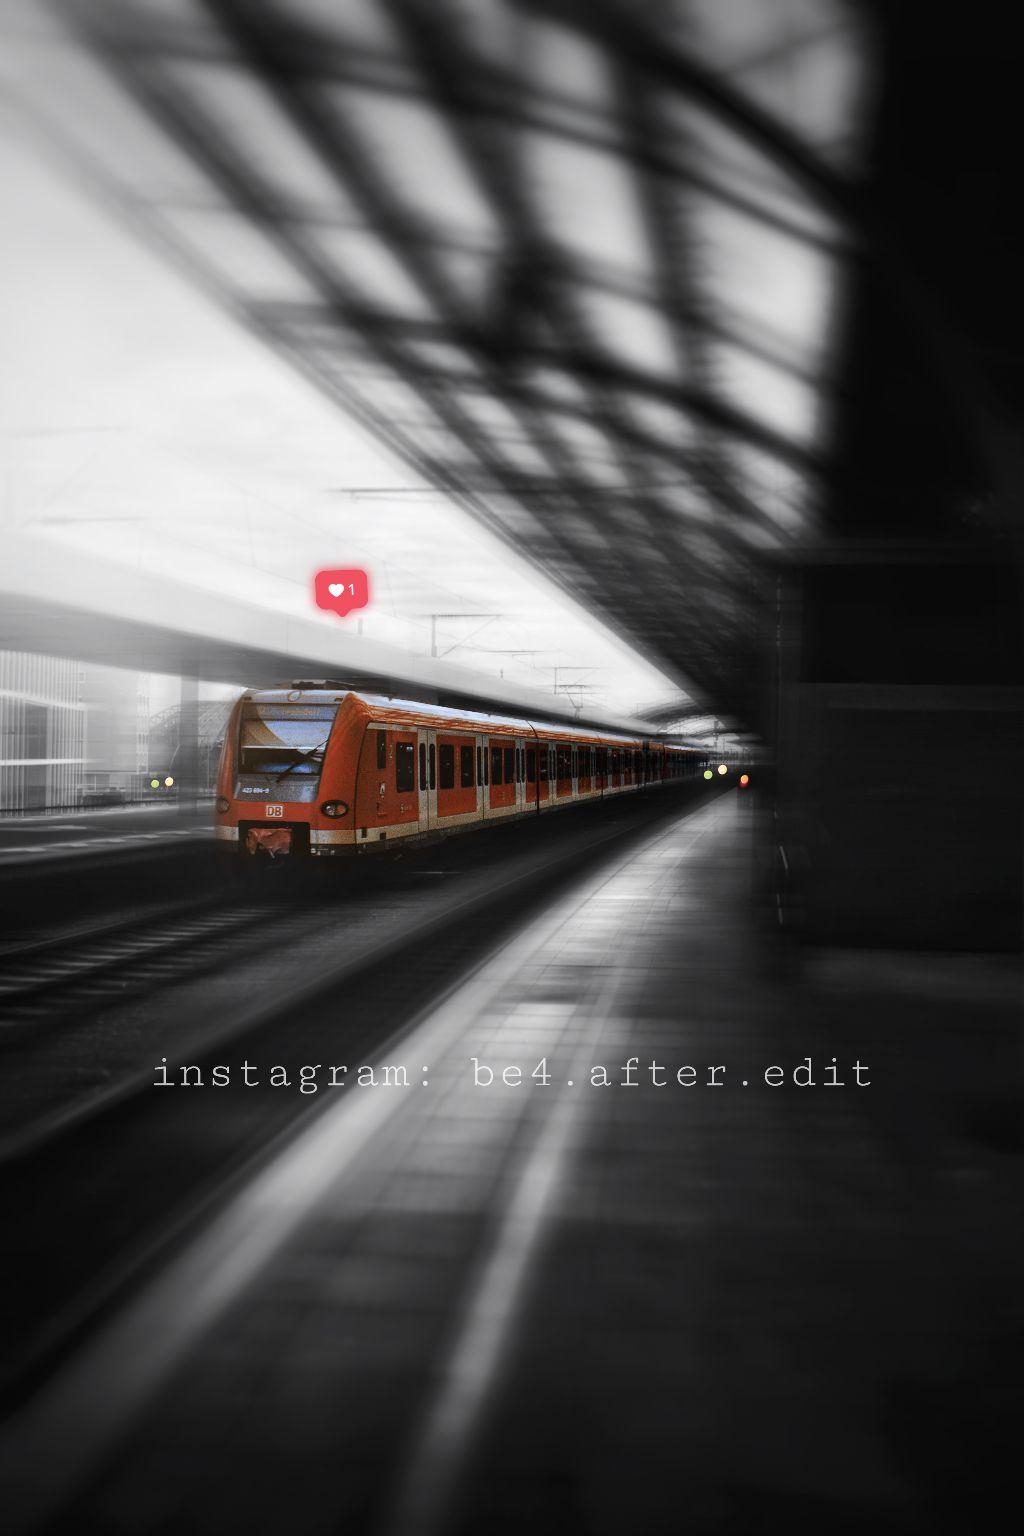 #freetoedit #train #splashofcolor #bnw_captures #blackandwhite #germany #bonn #cologne #photography #captured